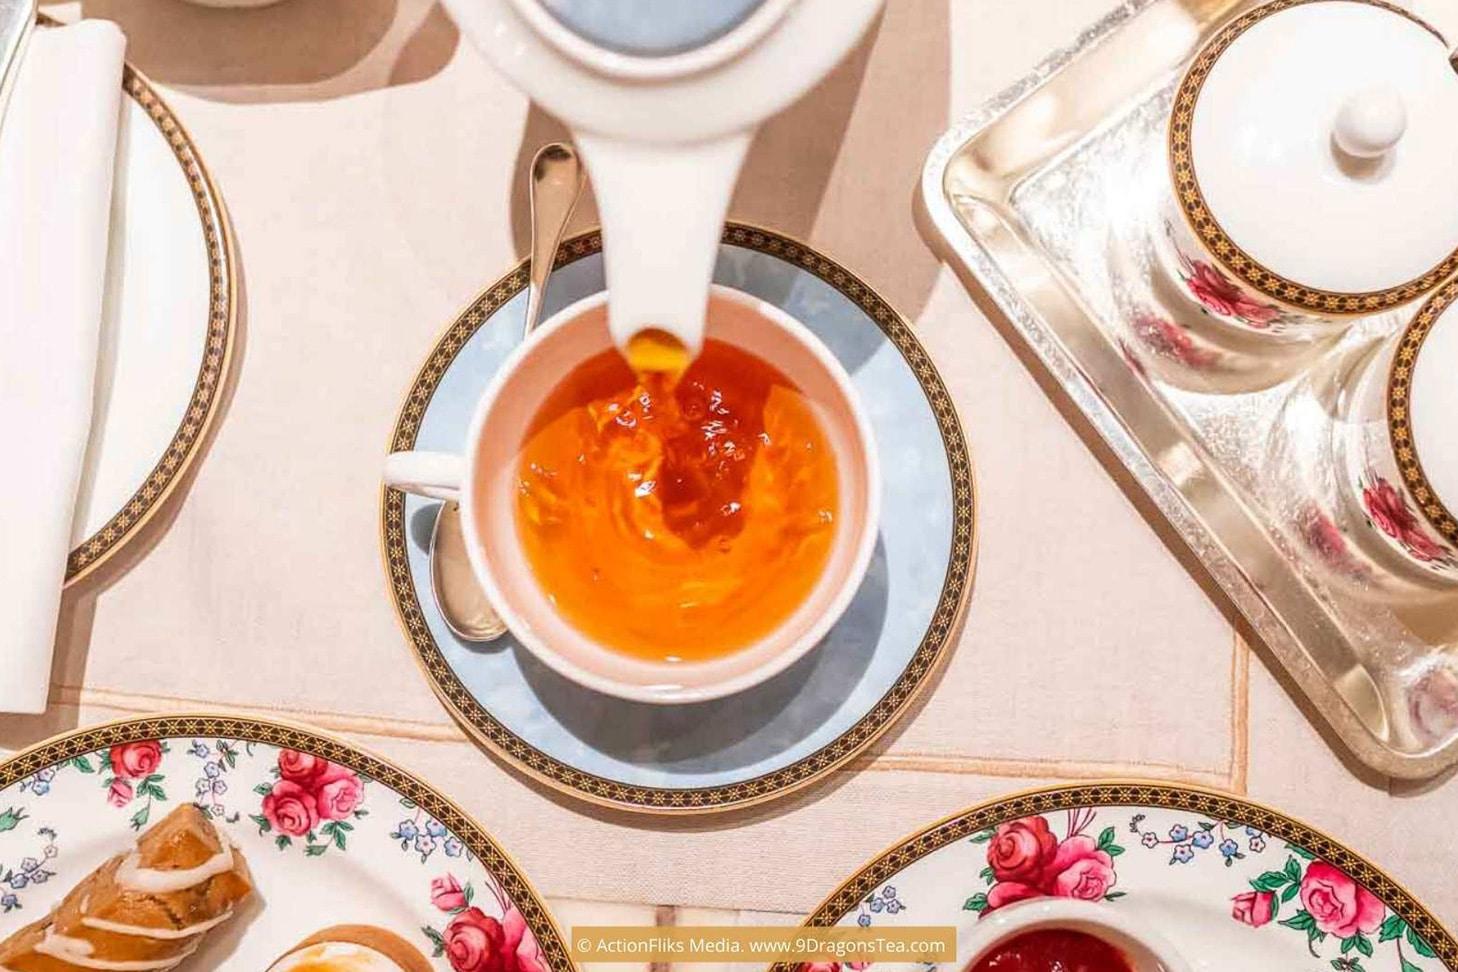 a cup of tea afternoon tea service